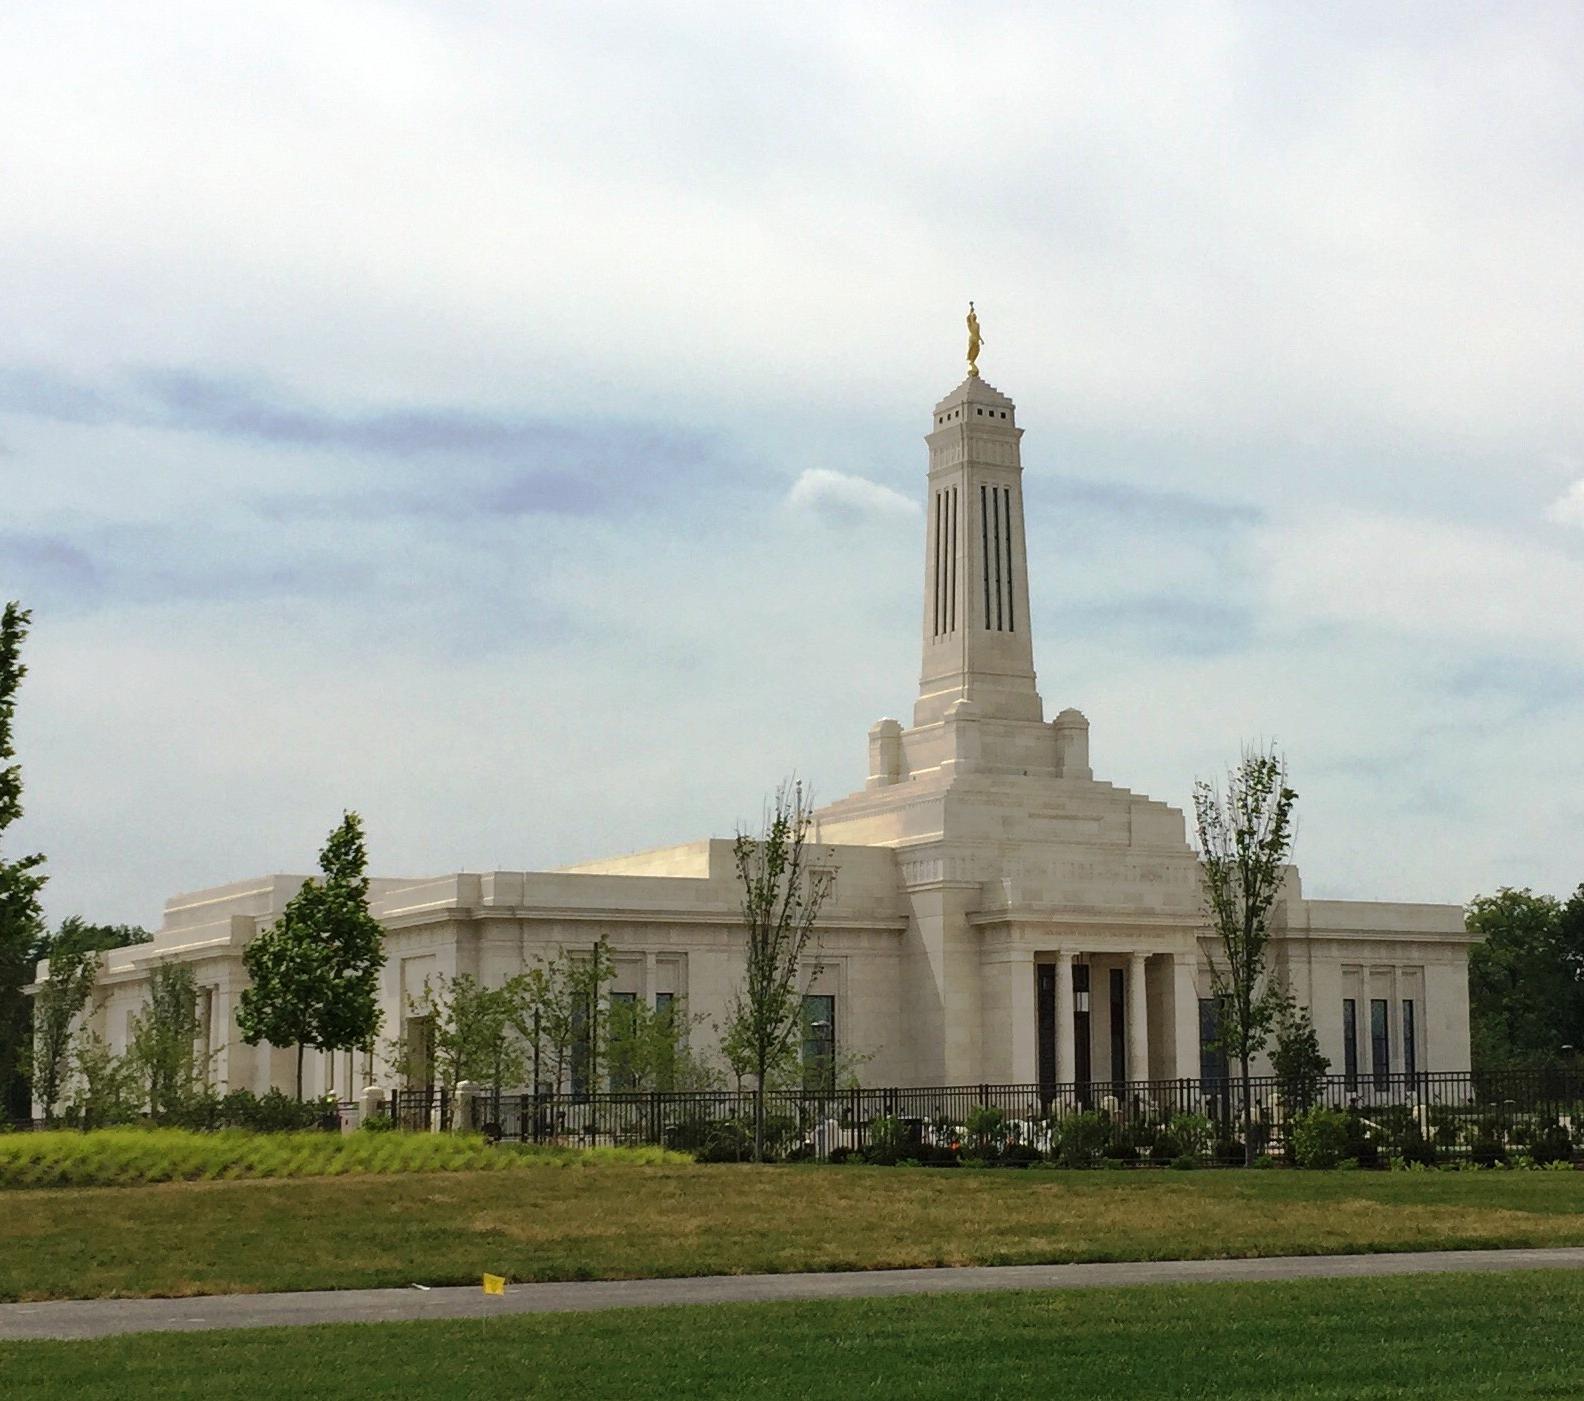 LDS CHURCH - CARMEL